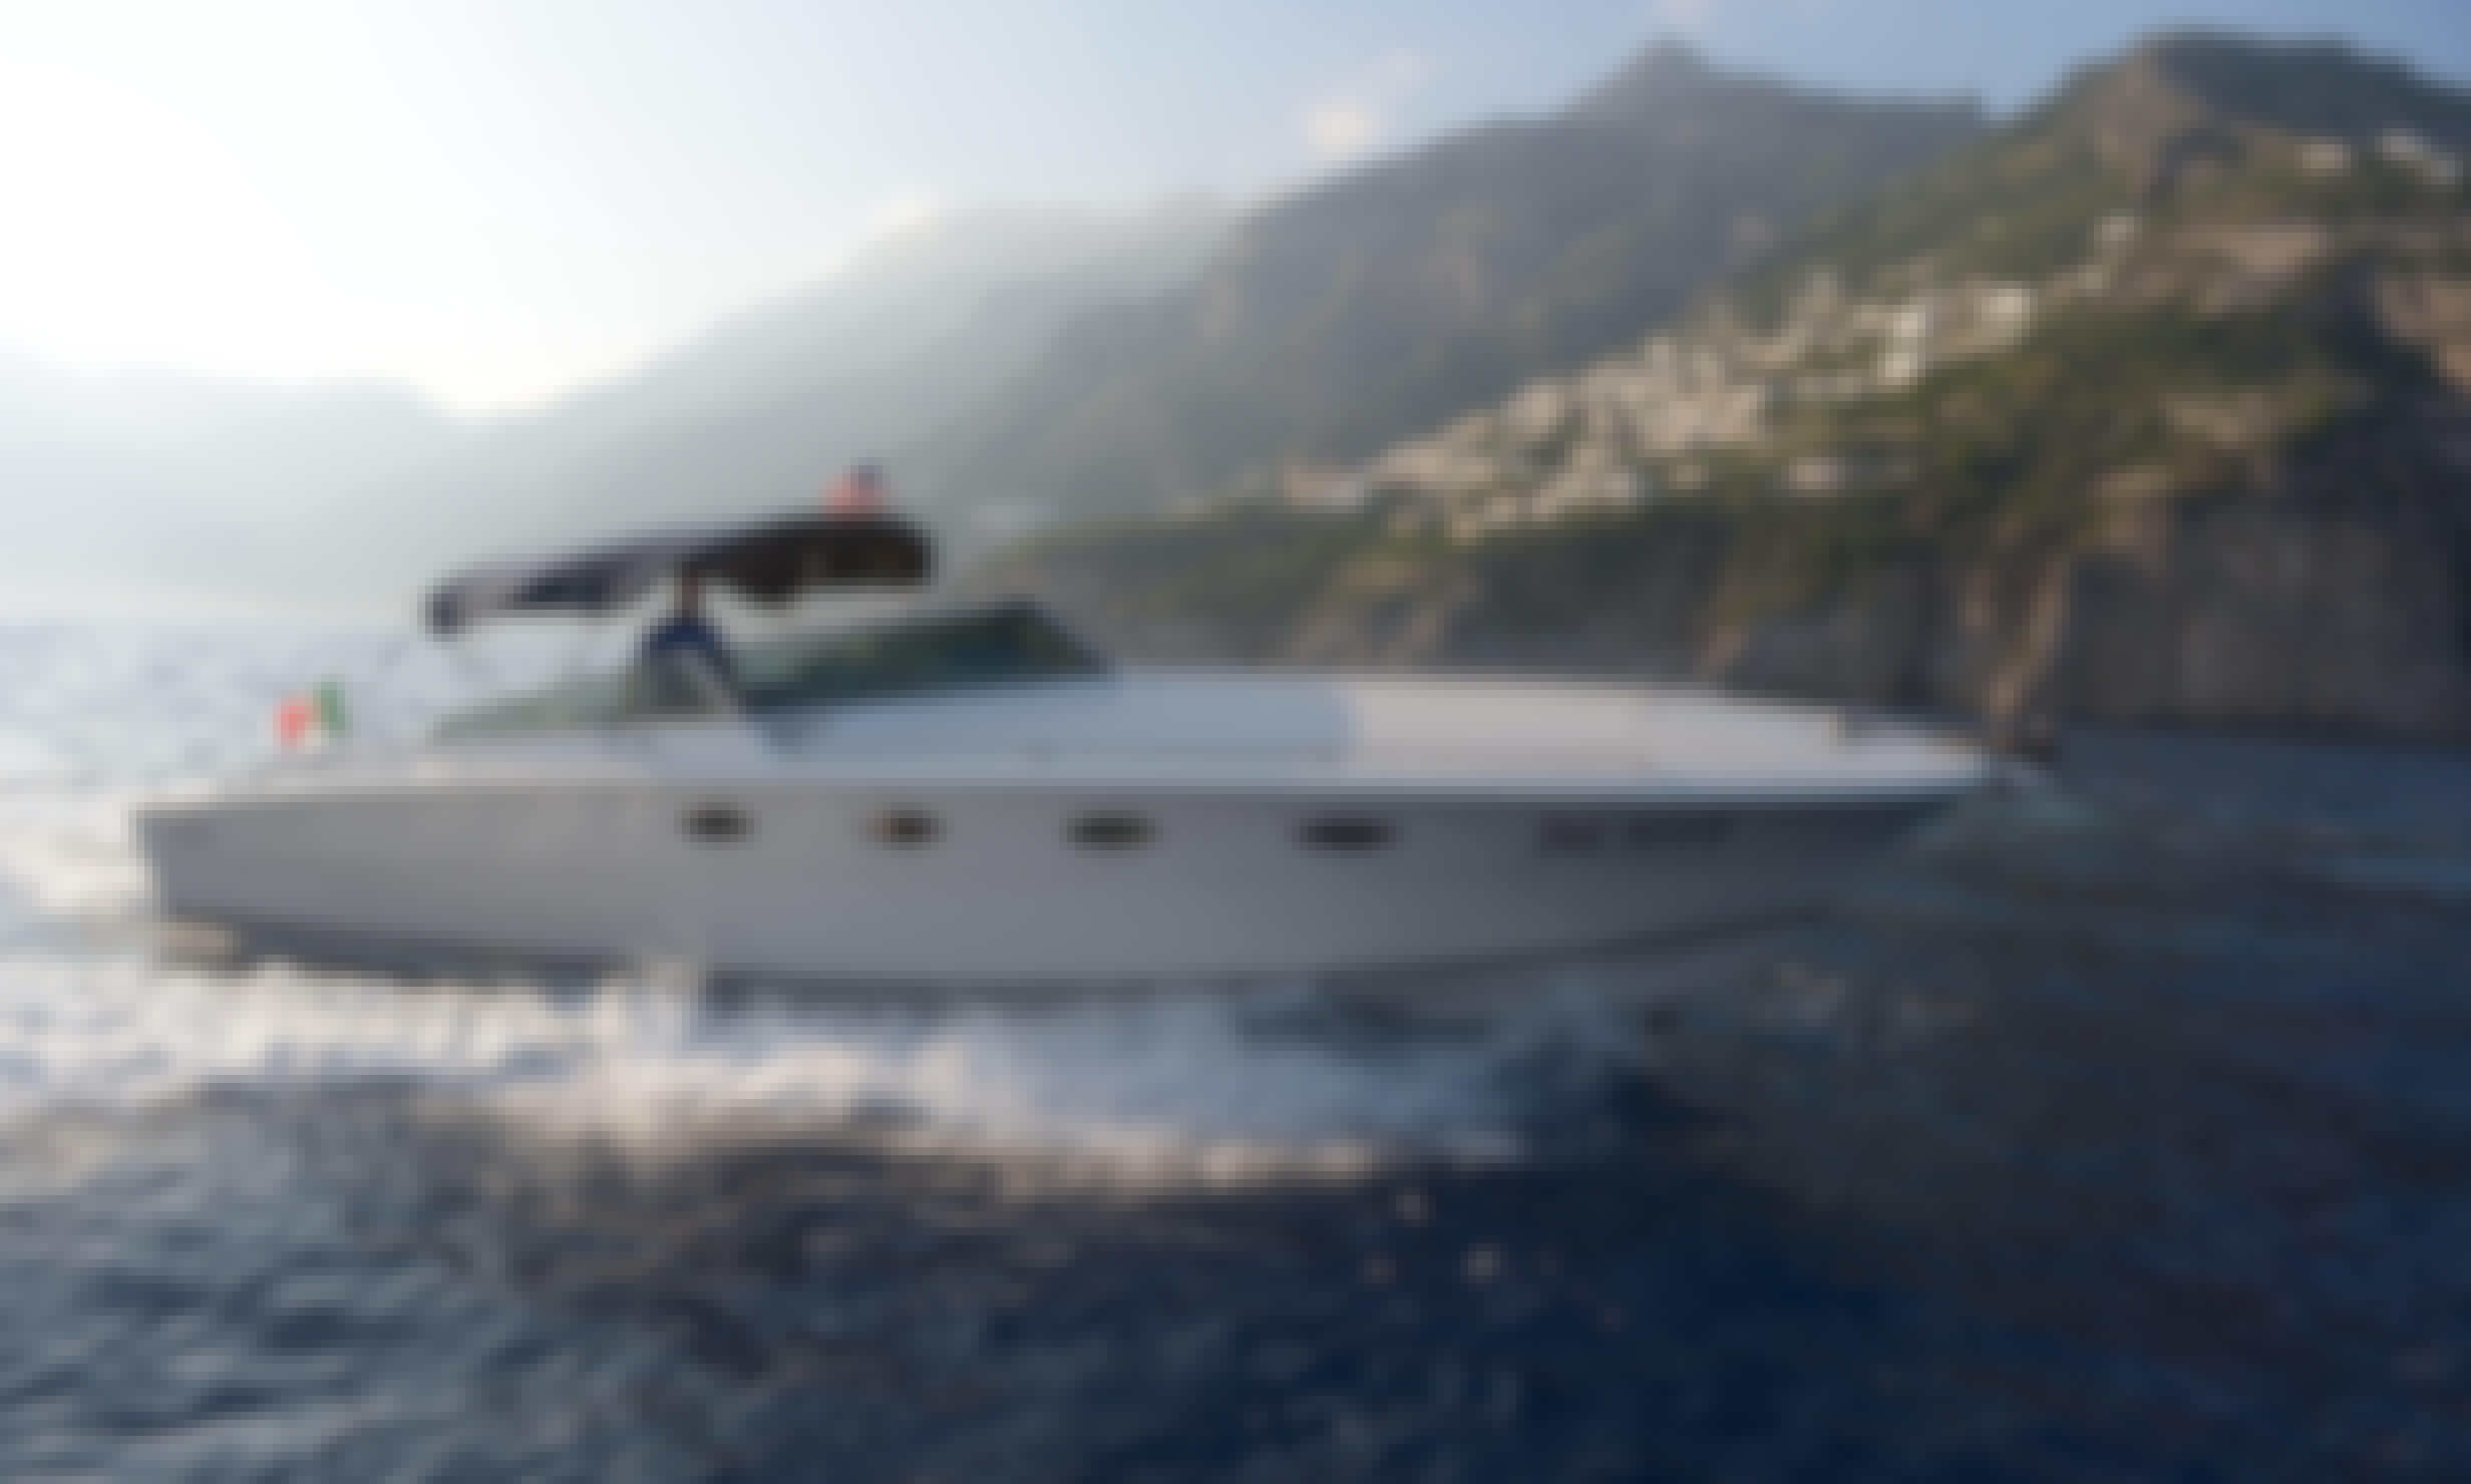 Tornado 38 Coral Bay Boat Rental in Maiori, Campania